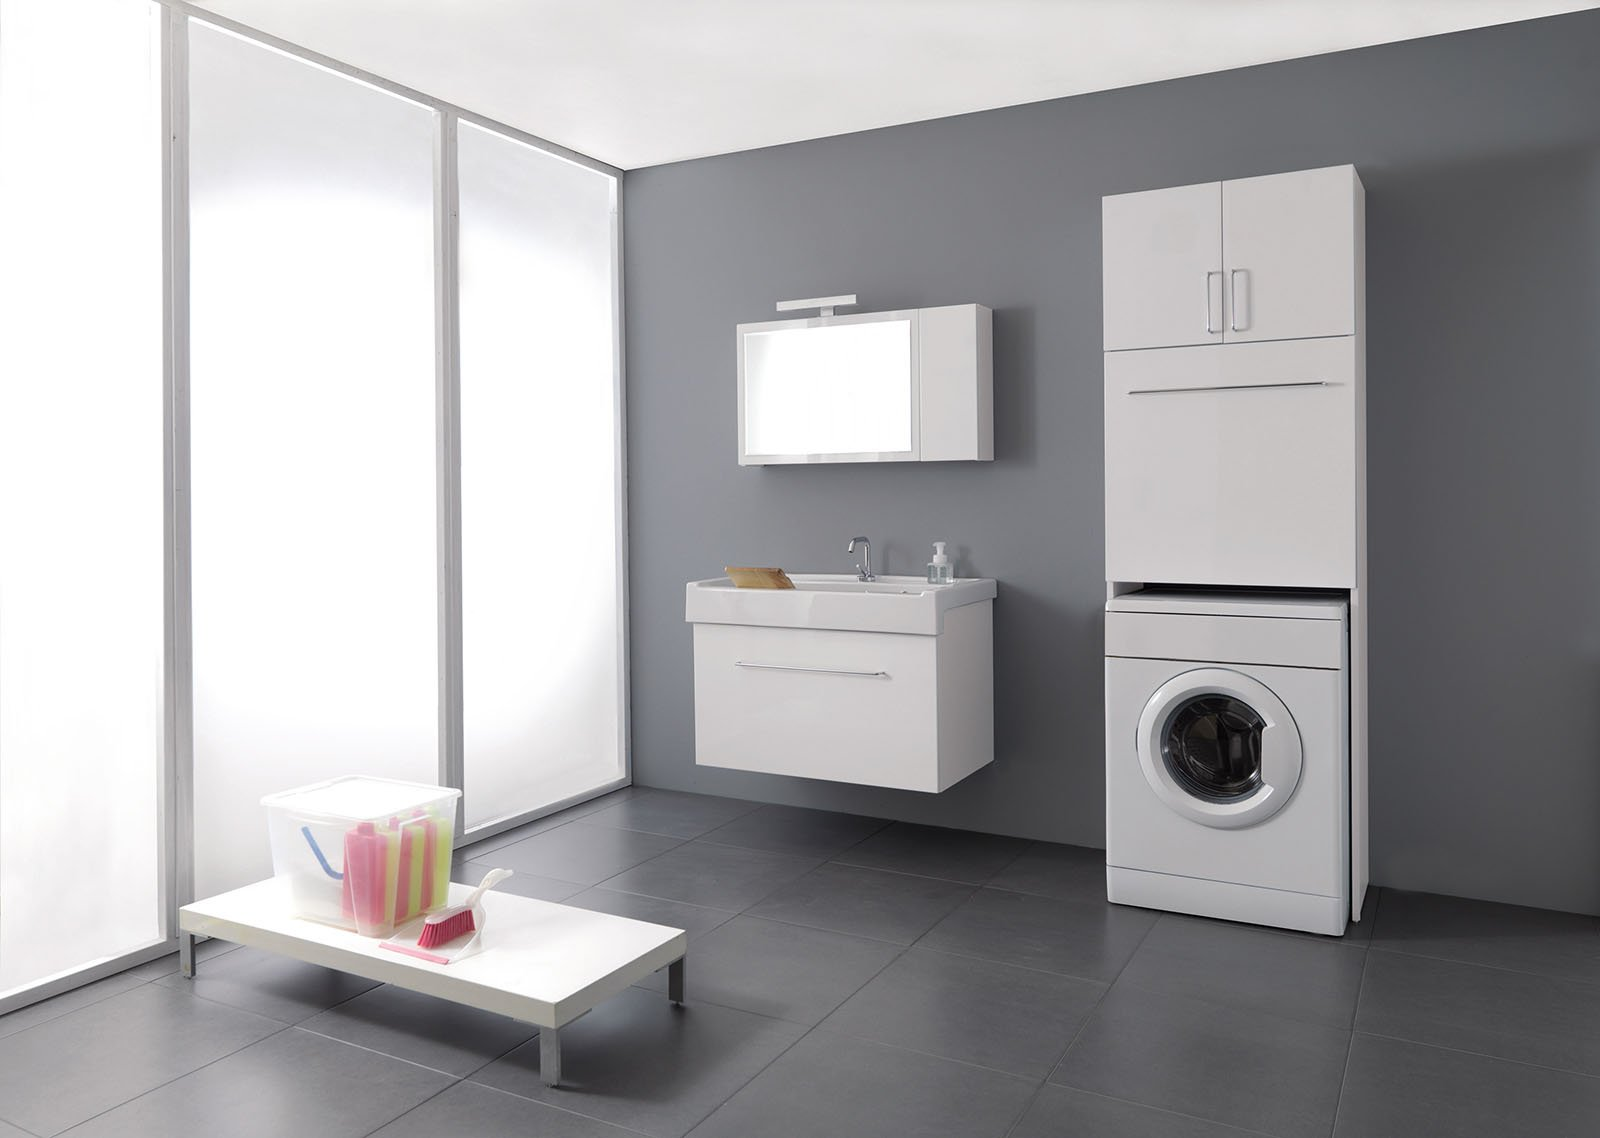 Lavabo bagno incasso ikea ~ avienix.com for .